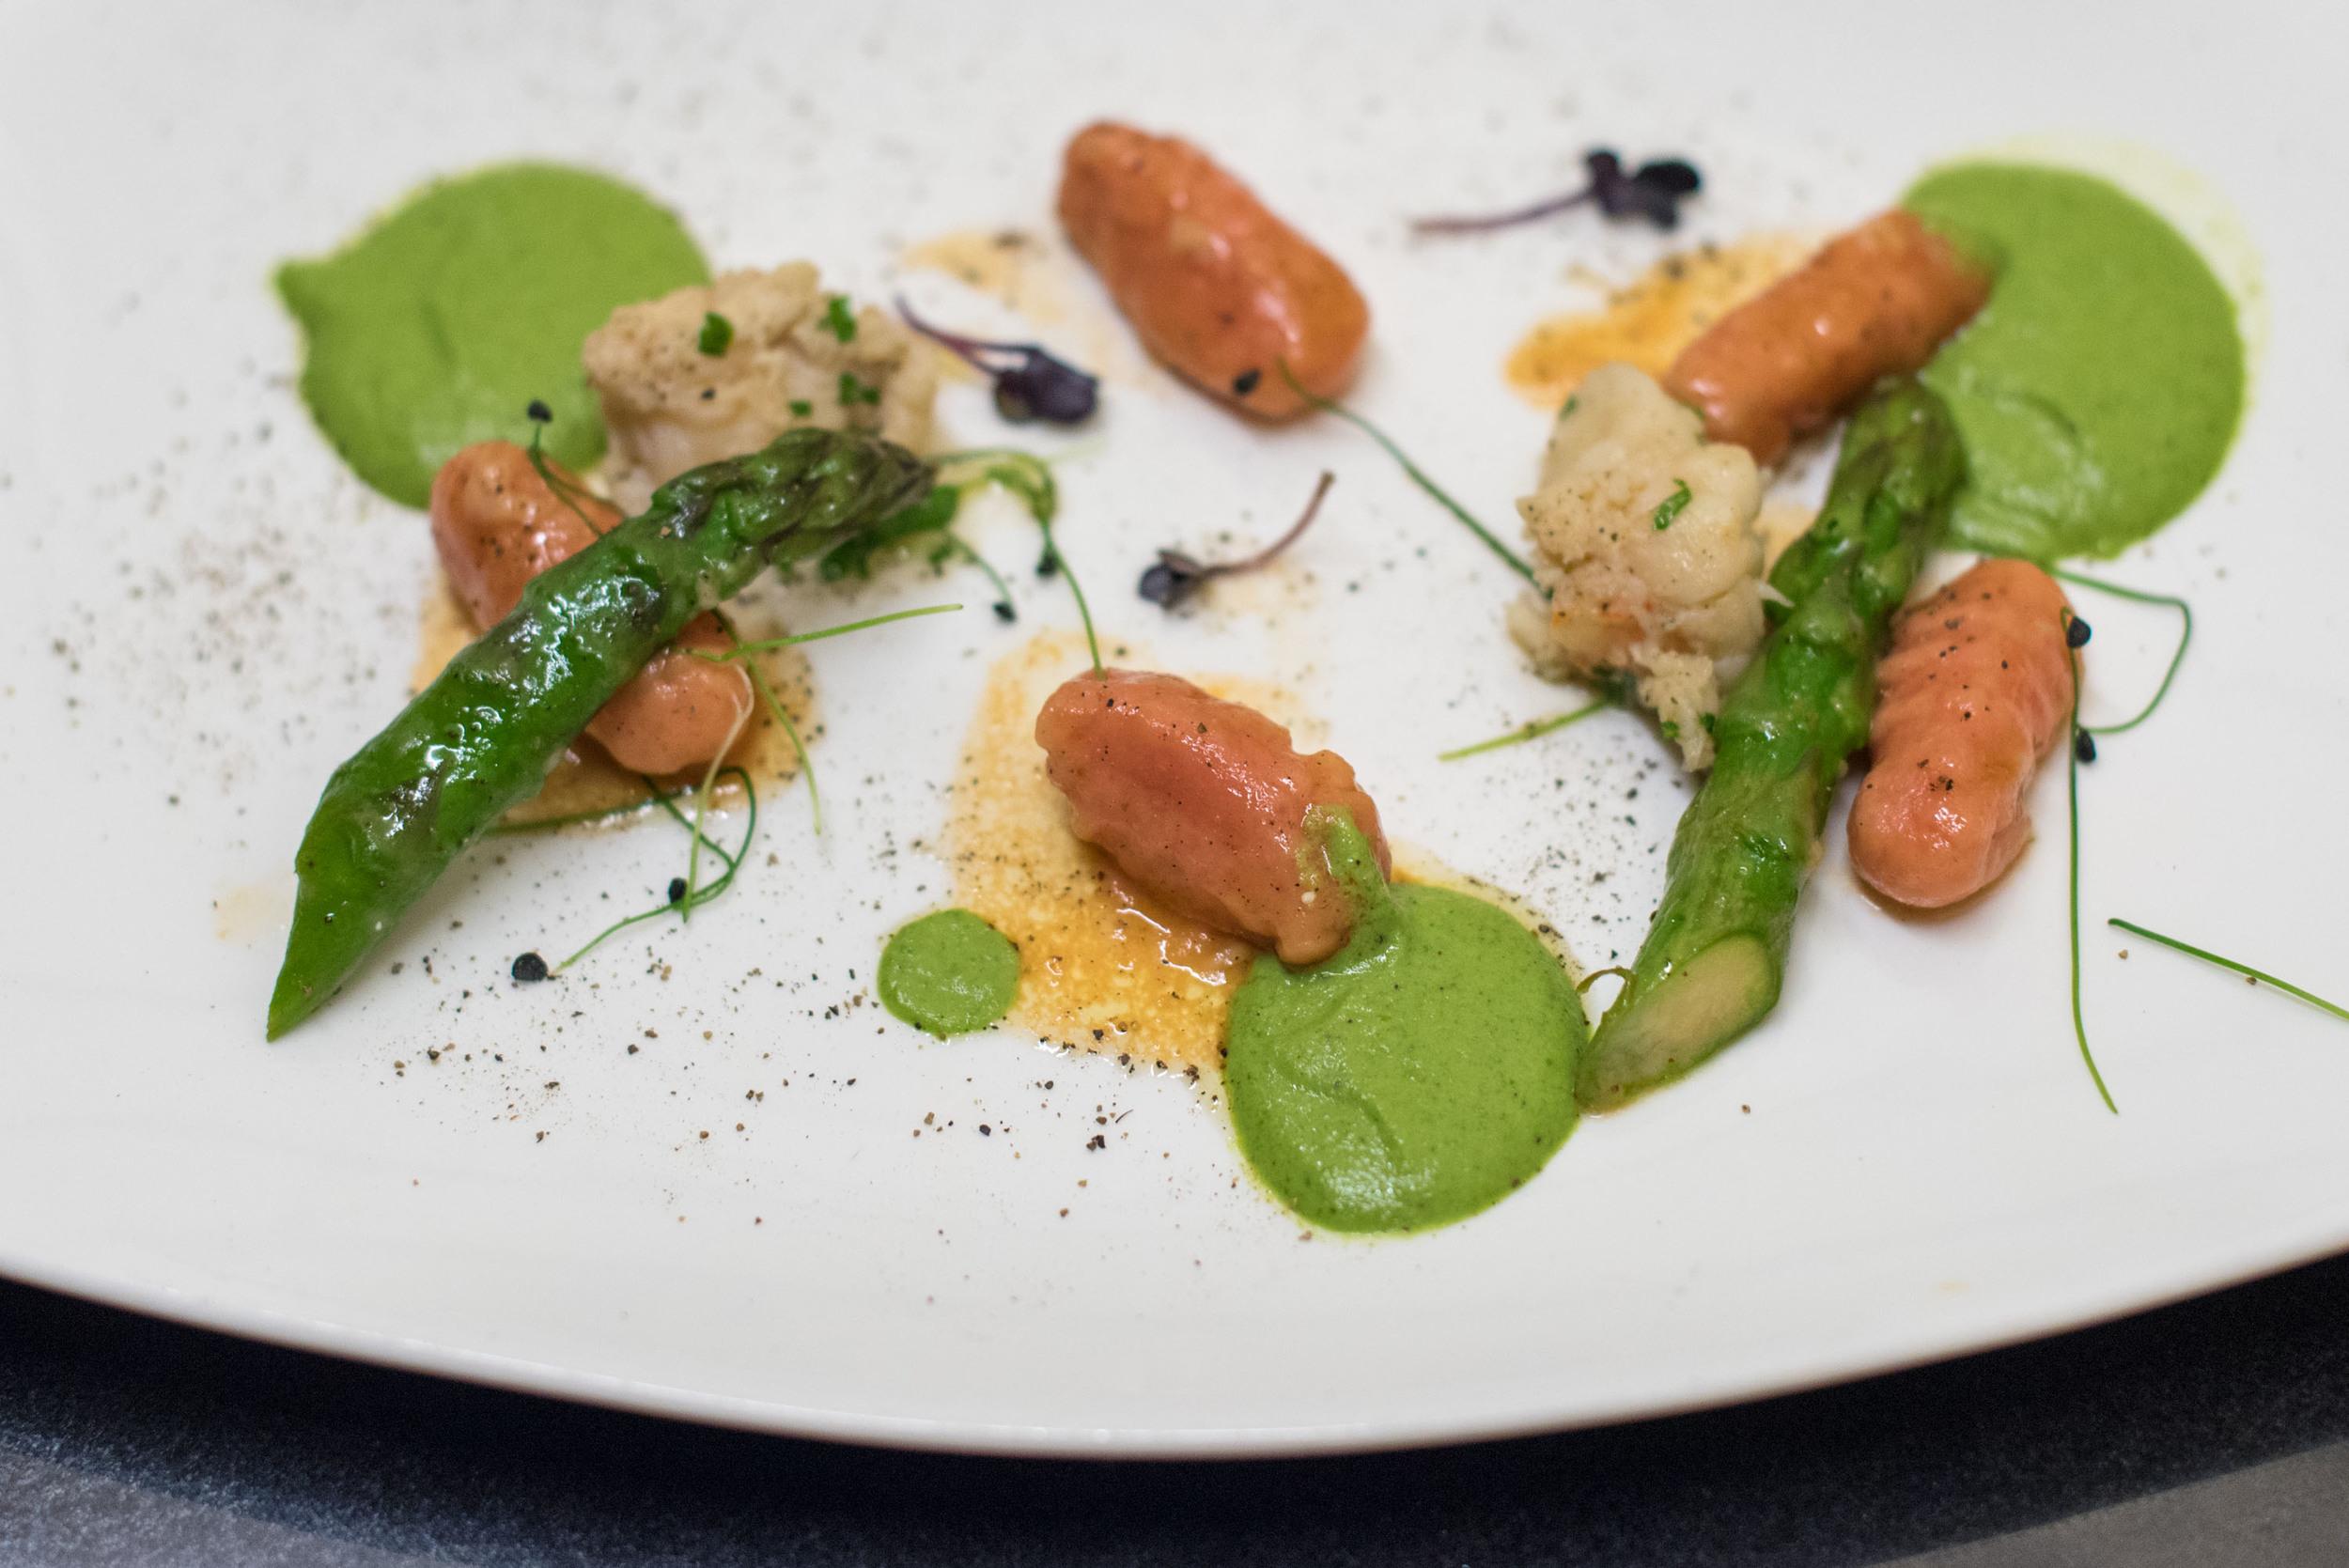 Homemade Beetroot Gnocchi with Boston Lobster and Asparagus Cream- 2016 Basilissimo  Basilico - Regent Singapore